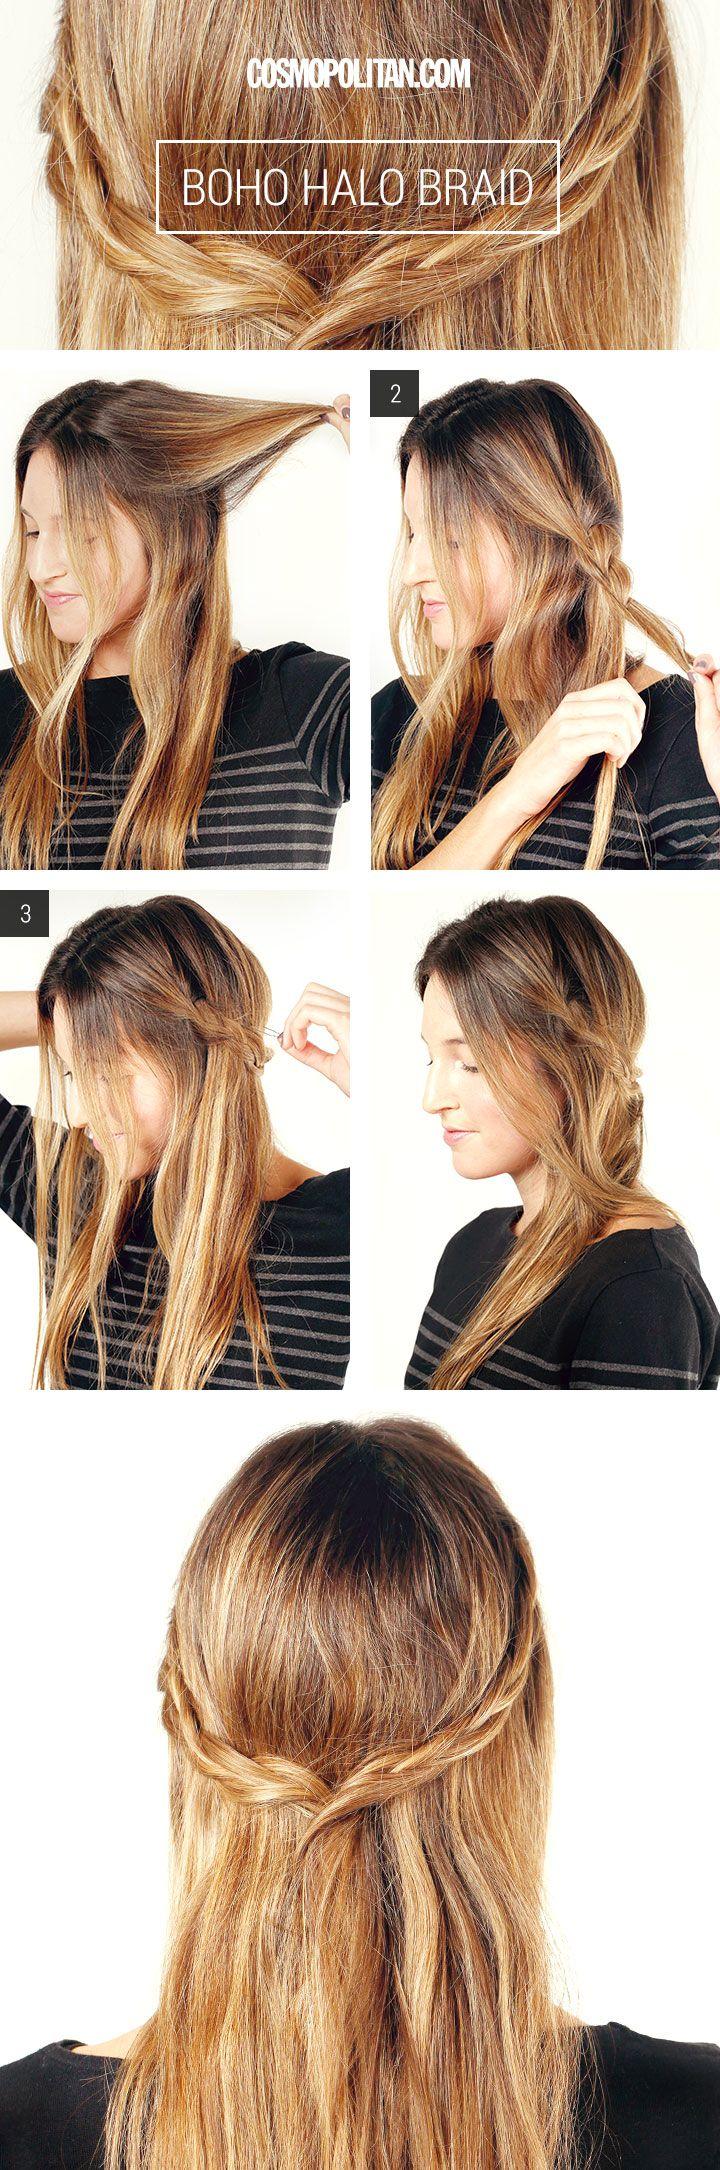 Hair How-To: the perfect Boho braid http://www.cosmopolitan.com/hairstyles-beauty/beauty-blog/bohemian-halo-braid-hair-tutorial